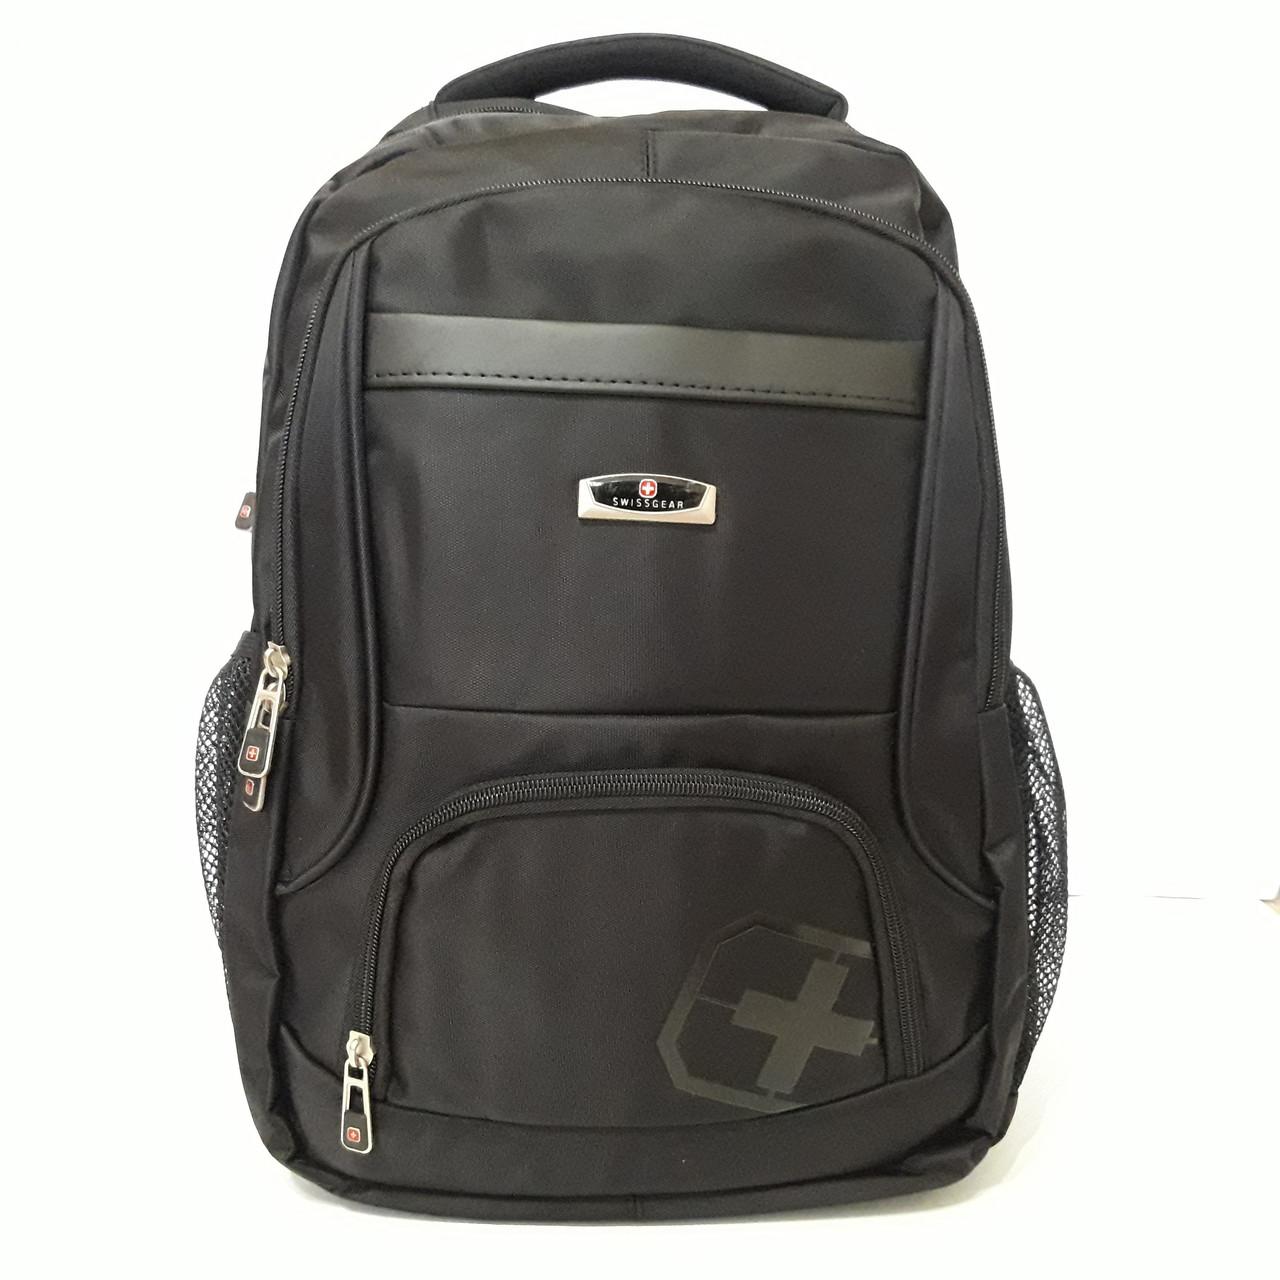 Рюкзак Swissgear для ноутбука 35 л